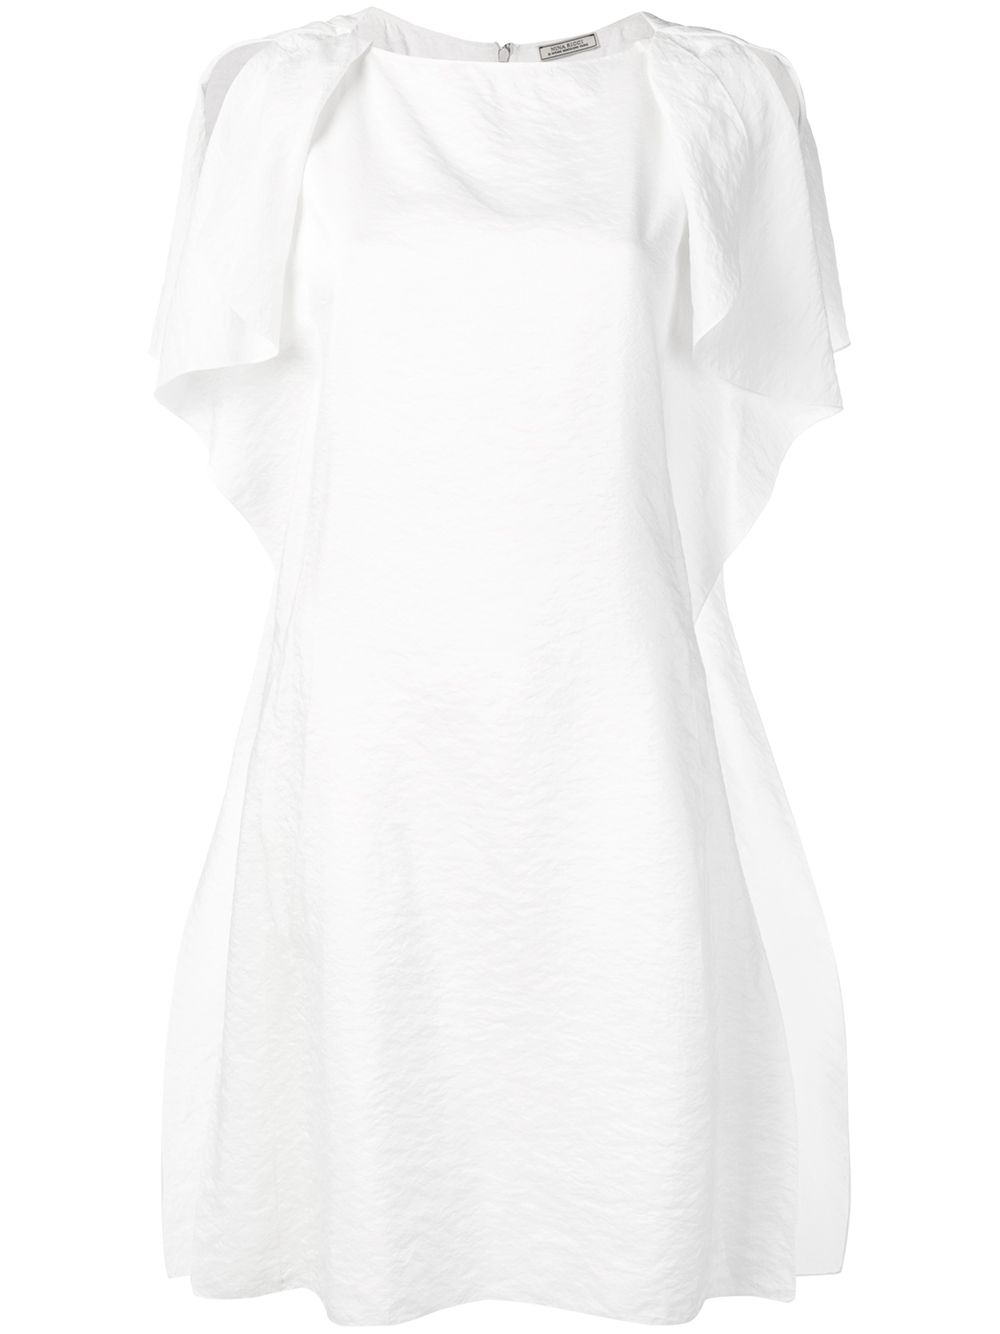 NINA RICCI | платье с оборками | Clouty